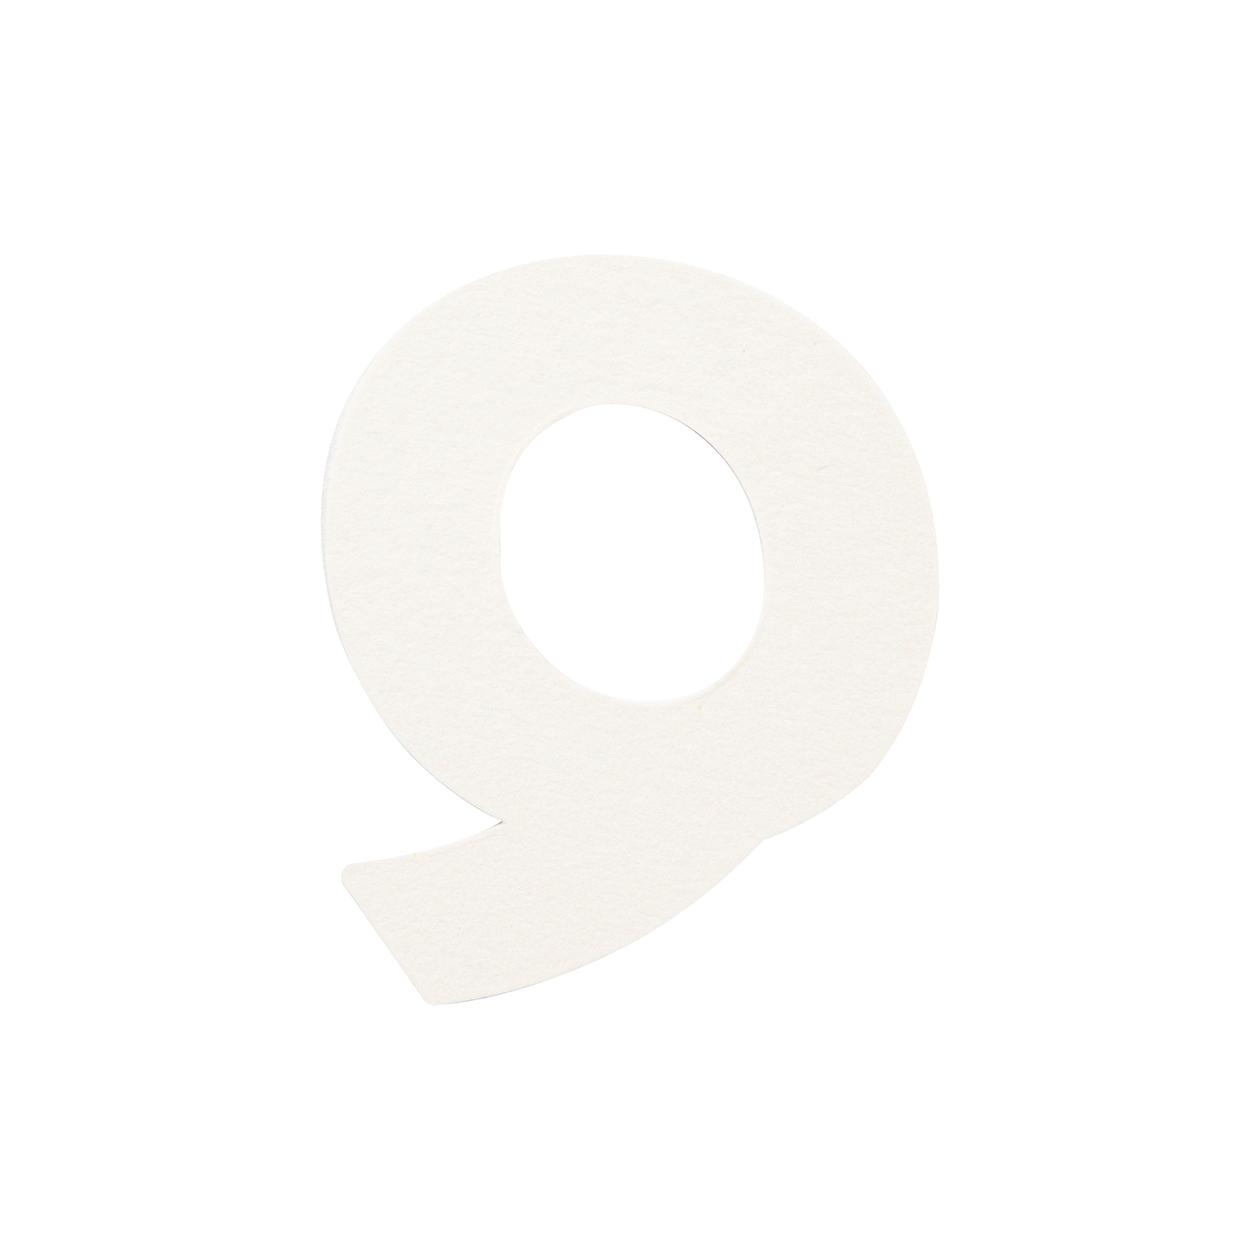 No.395ボード A7カードDC 文字Q シルバー